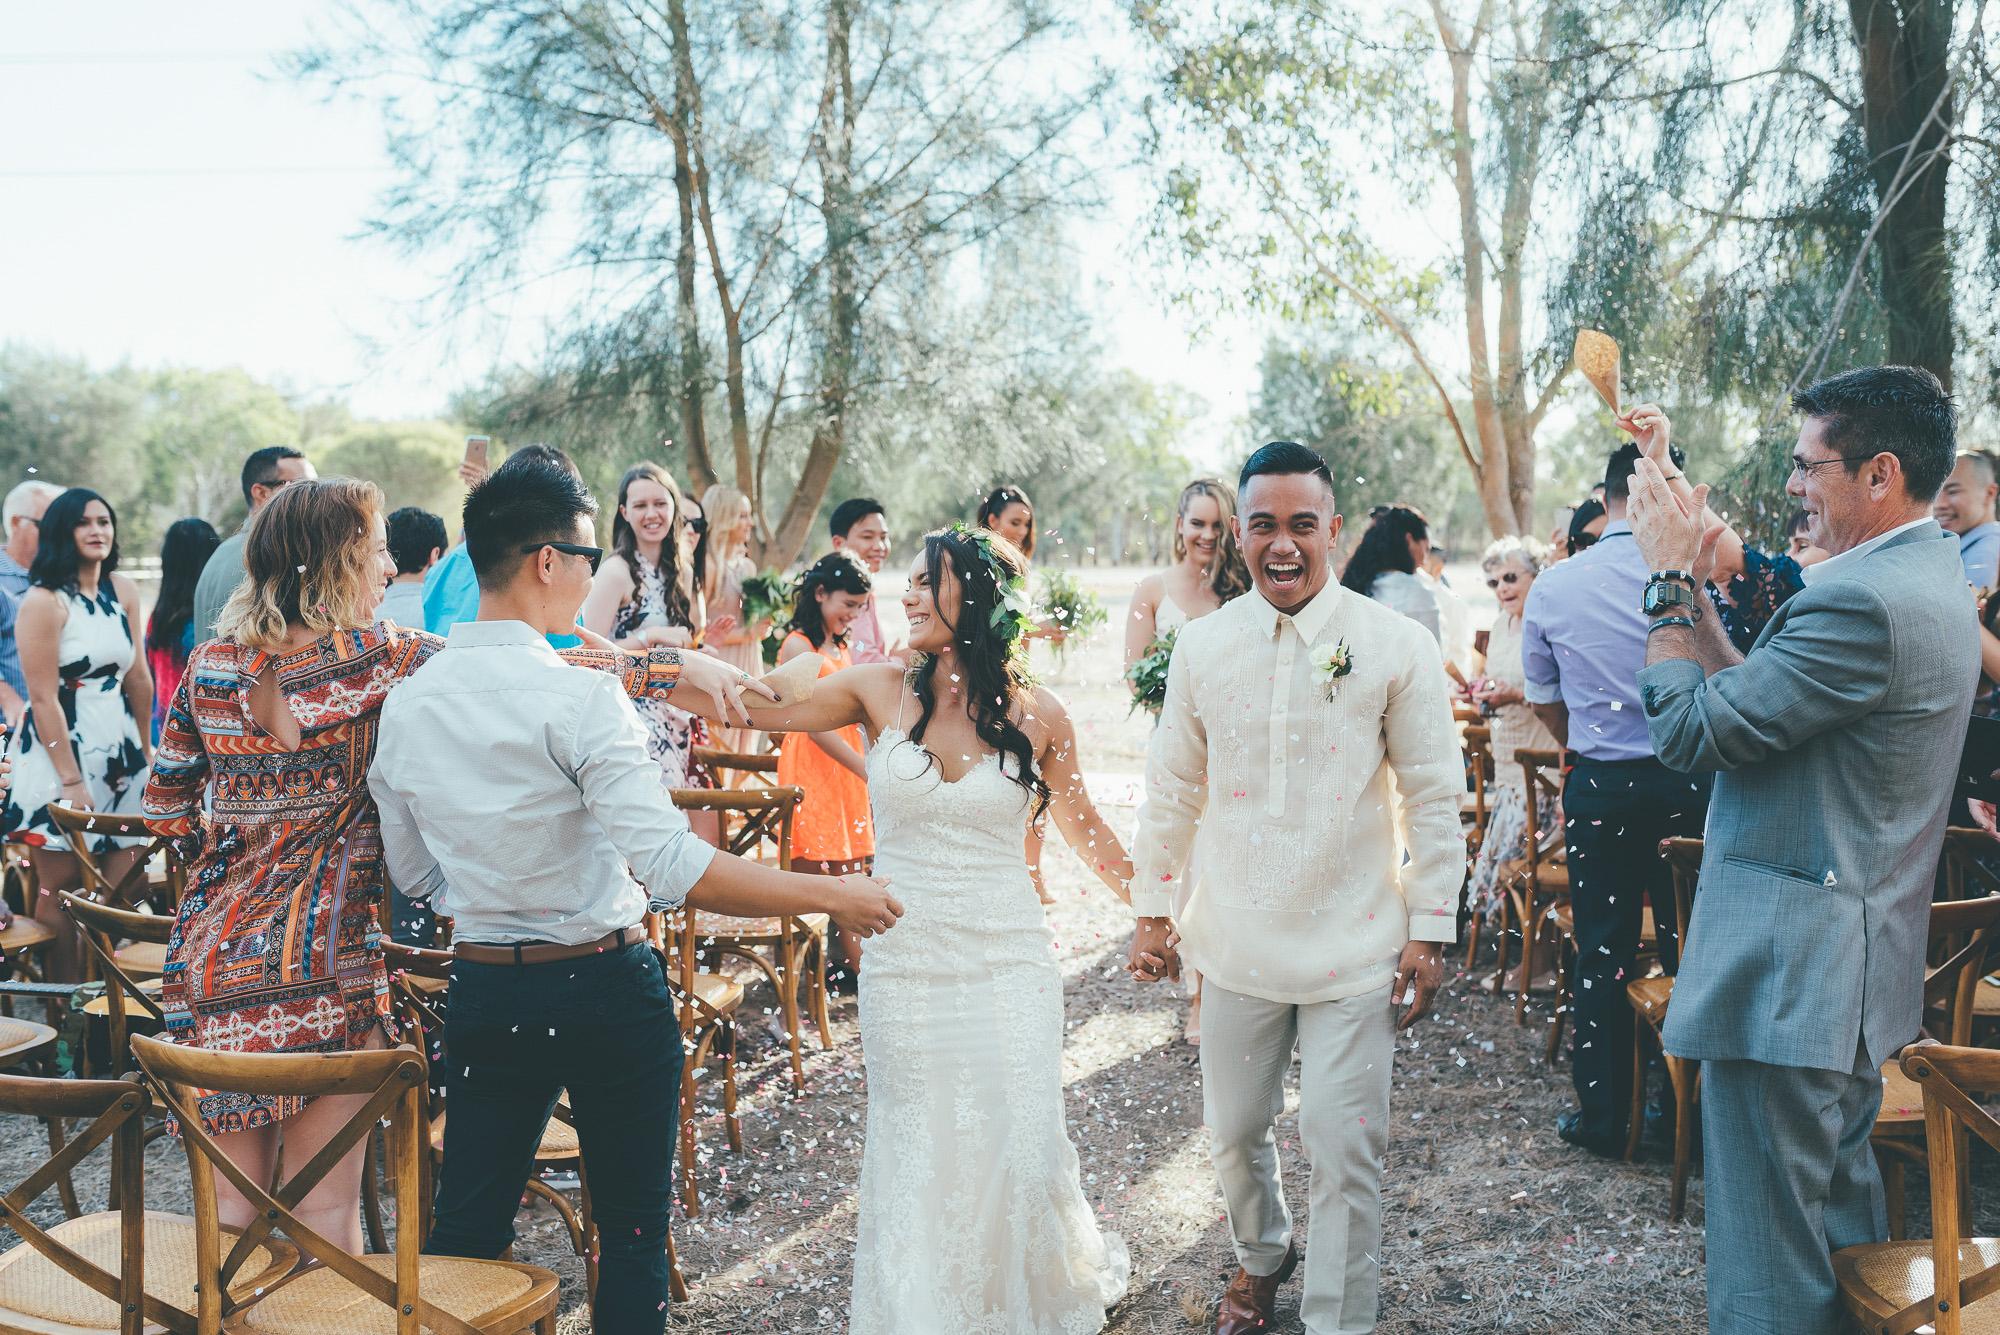 wedding-photographer-outdoor-casual-styled-los-angeles-australia-california-international-earthbound -48.jpg